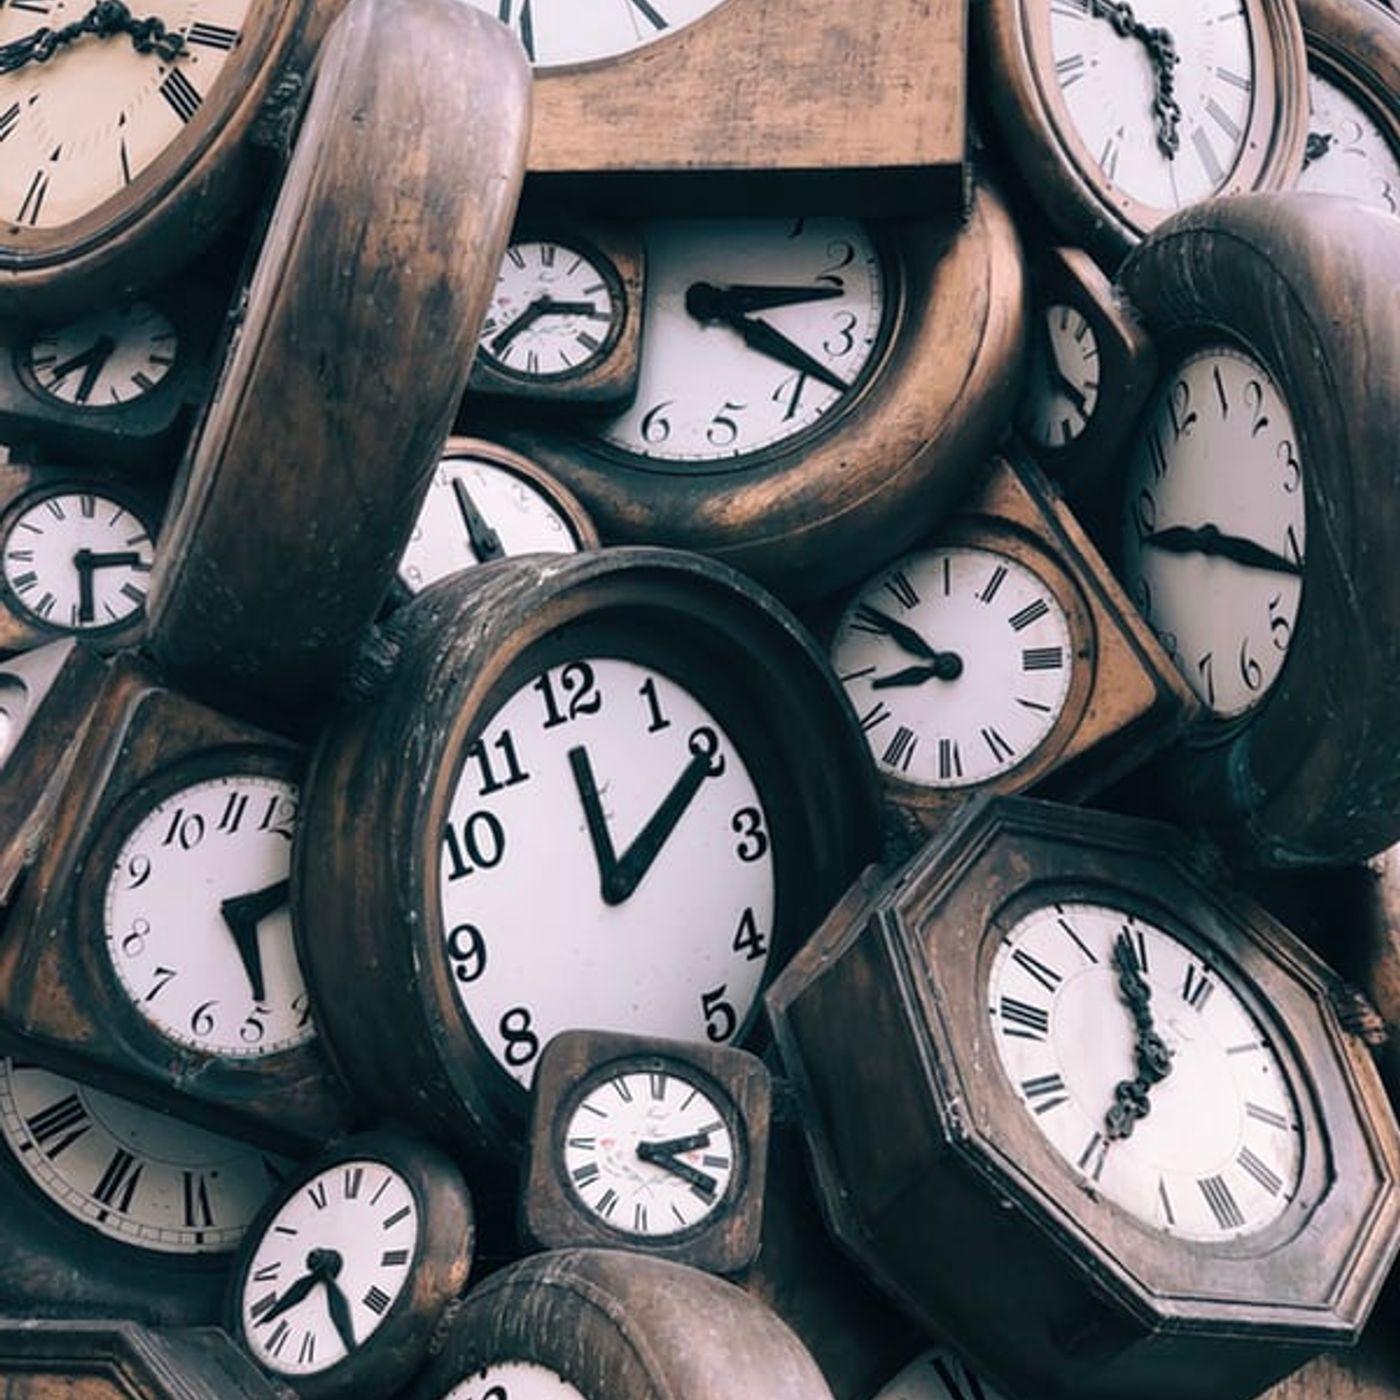 Oct 23 The Clock Ticks